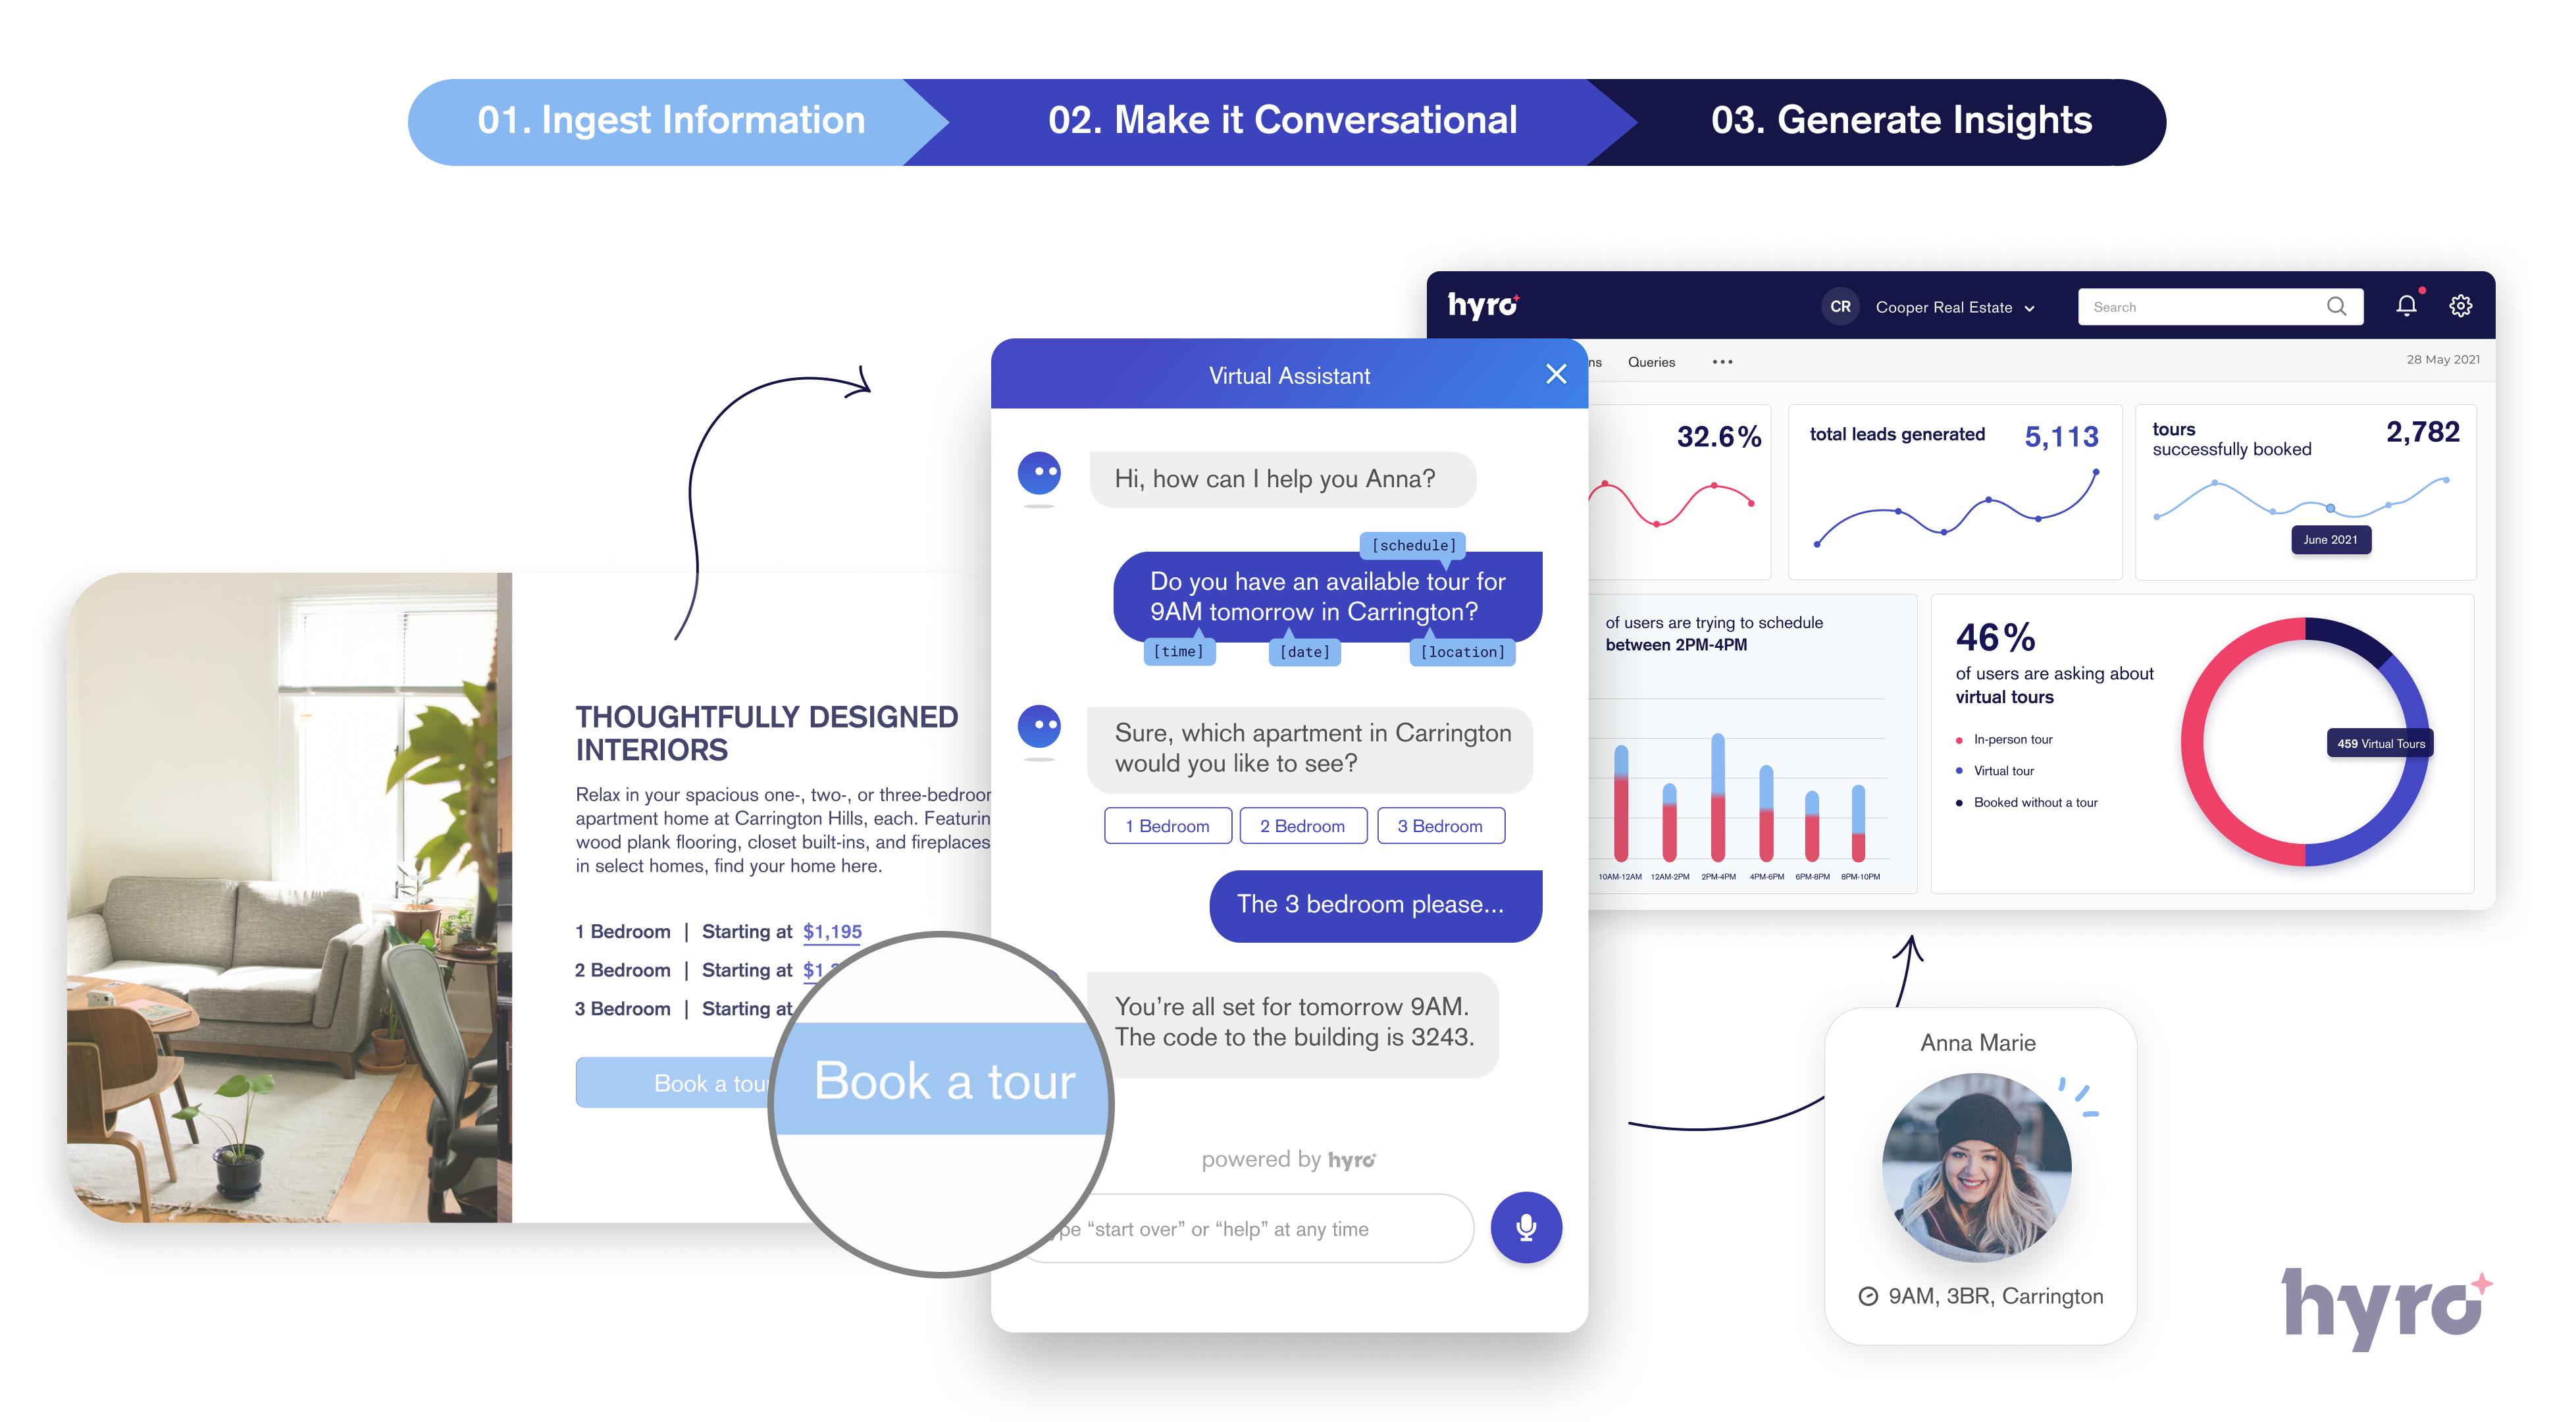 Hyro's Adaptive Communications Platform for Real Estate